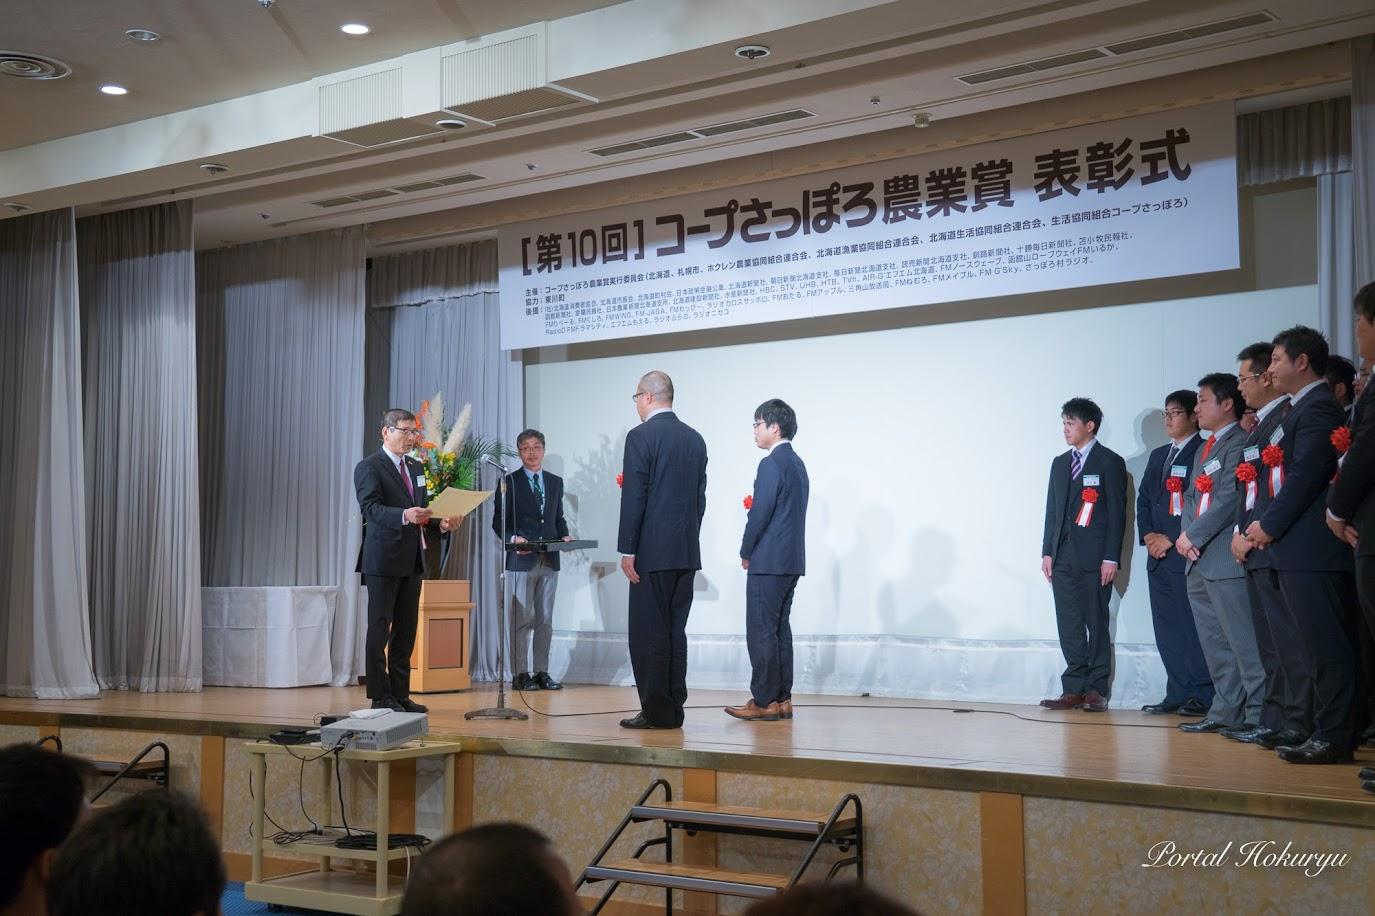 札幌市長賞授賞の様子